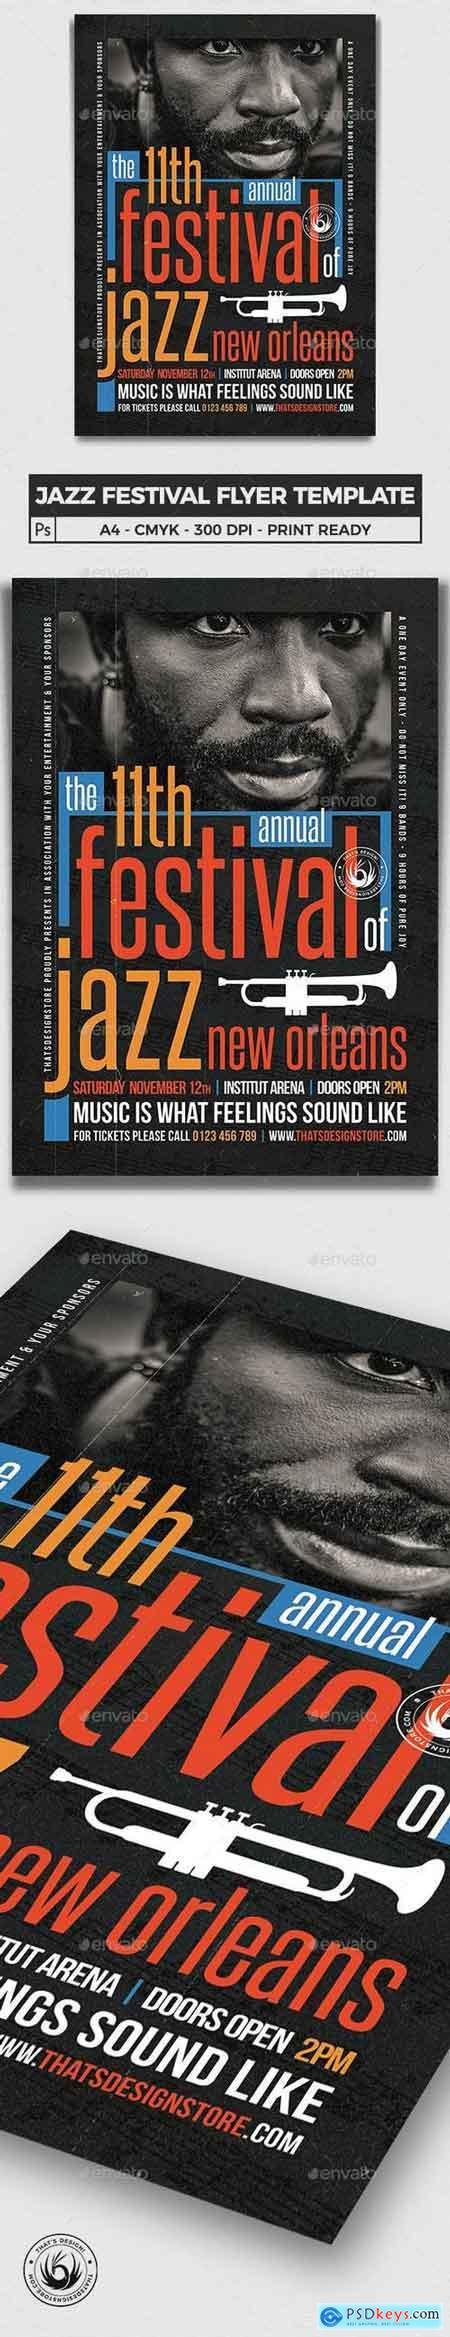 Graphicriver Jazz Festival Flyer Template V10